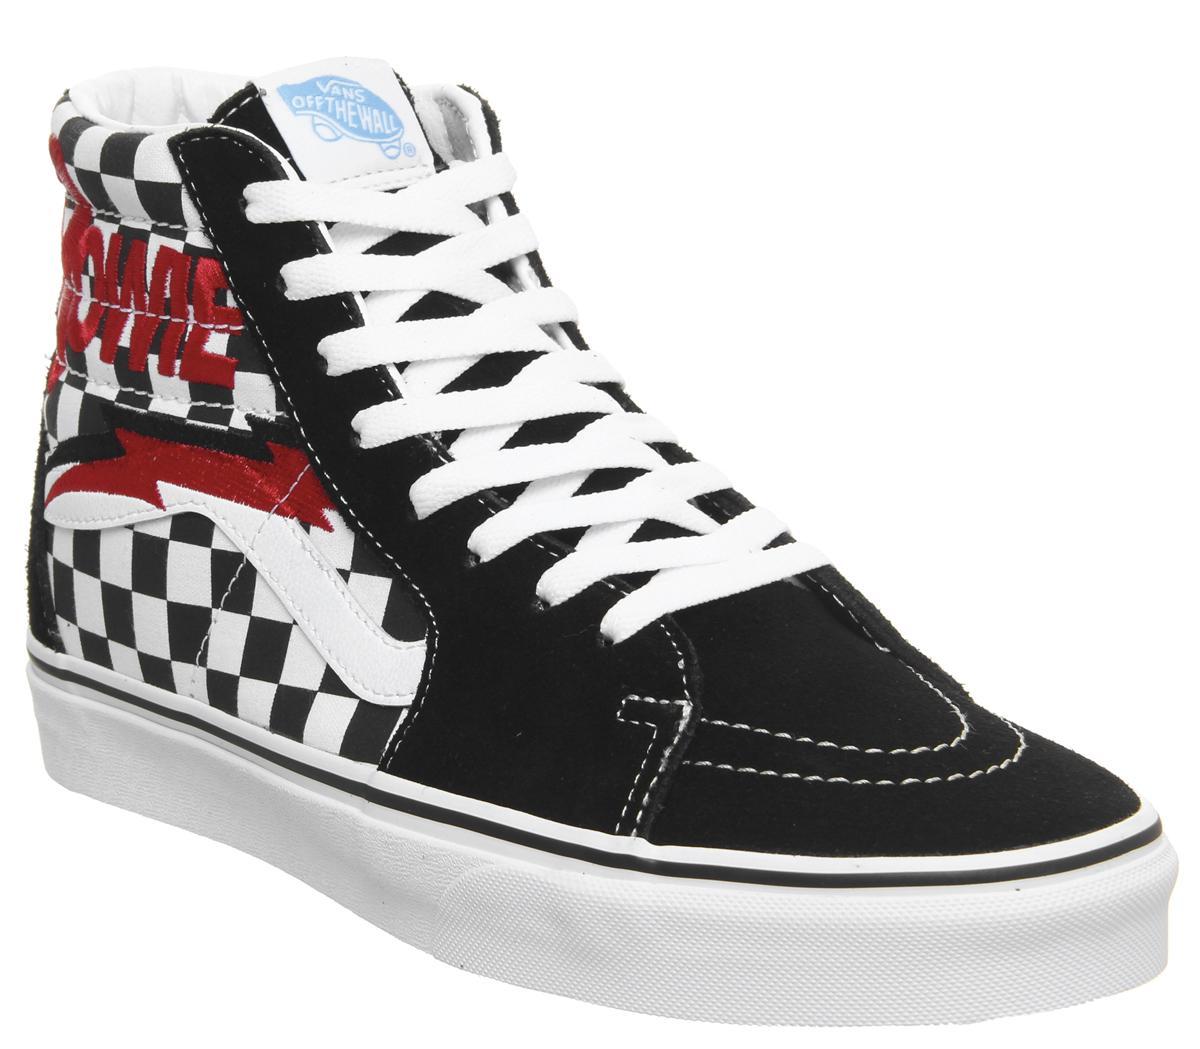 Vans Sk8 Hi Trainers Bowie Checkerboard